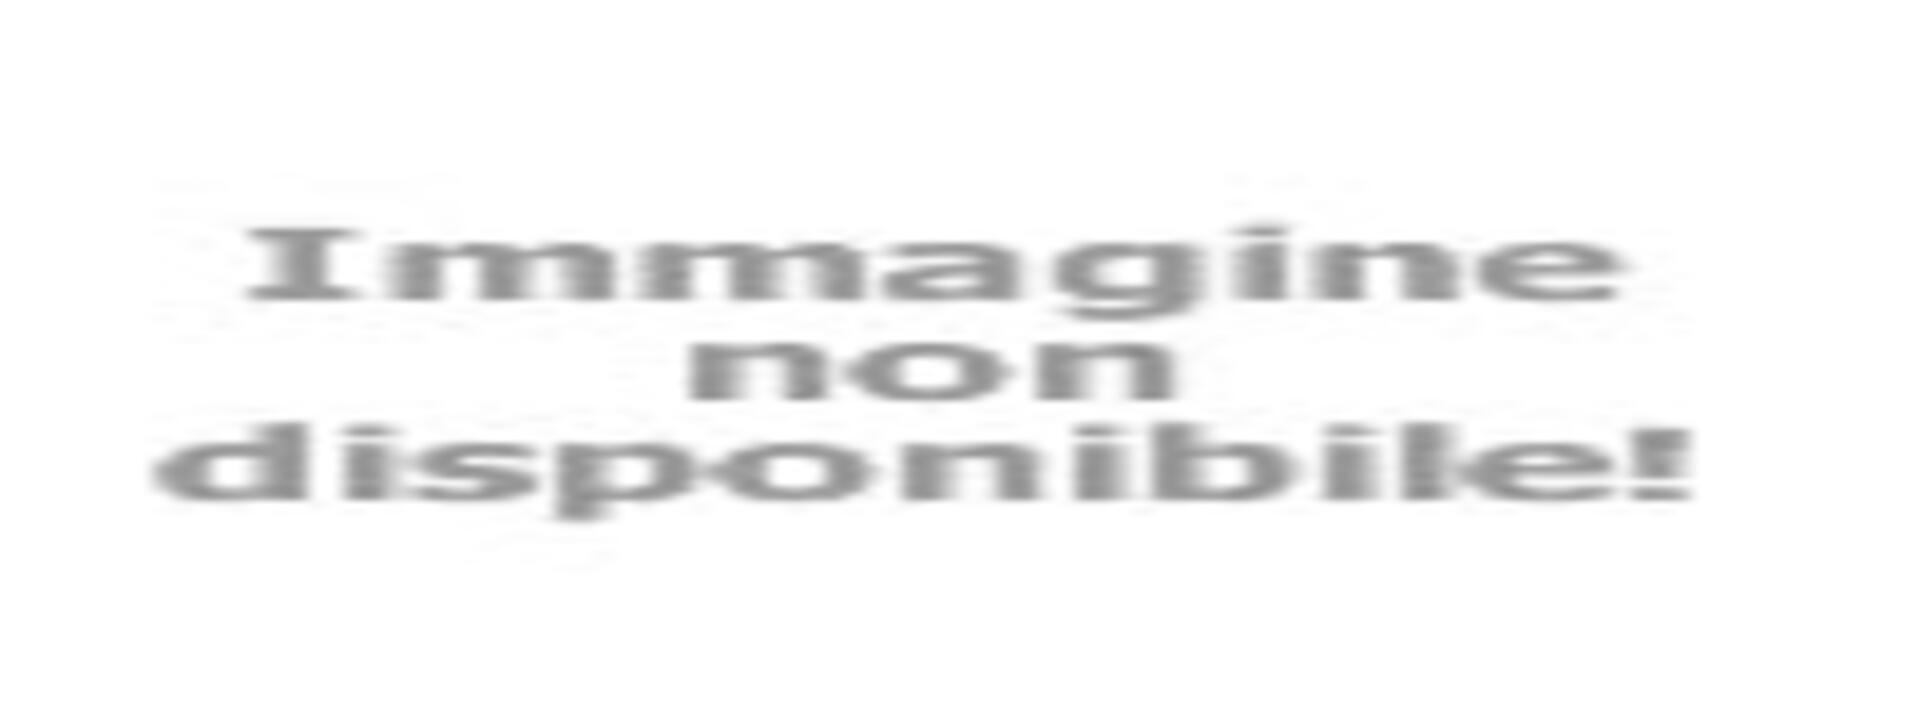 sangregorioresidencehotel it business-hotel-pienza 004